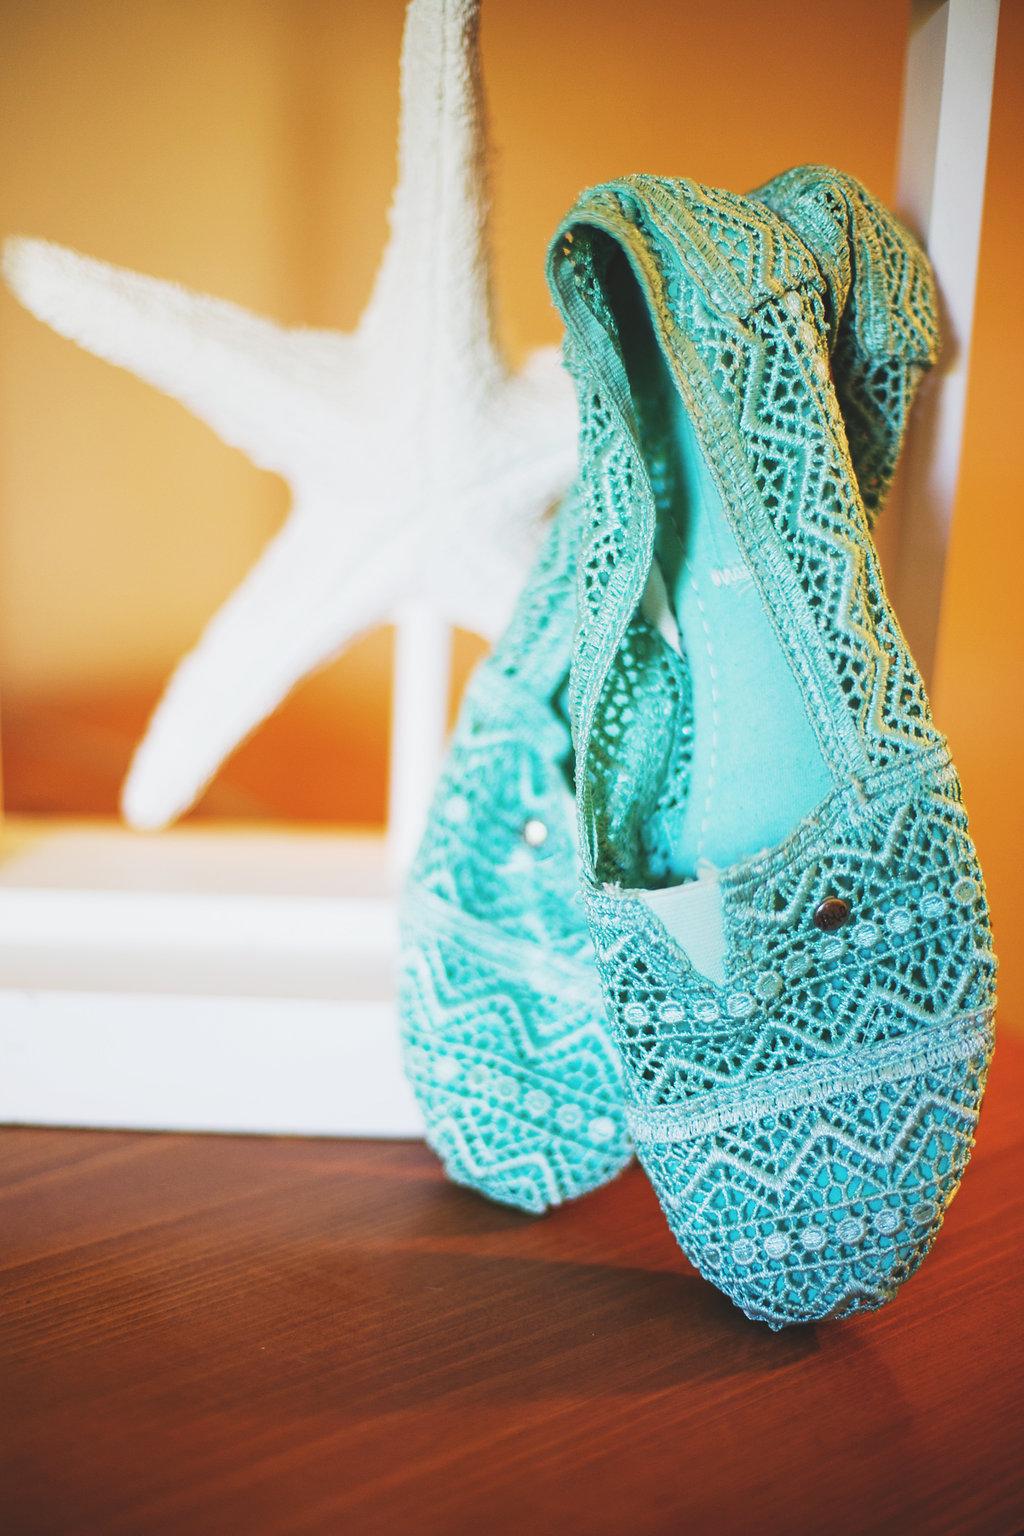 Laura + Matt Featured DIY Wedding // The Overwhelmed Bride Bridal Lifestyle + Wedding Blog // Wedding Shoes TOMS